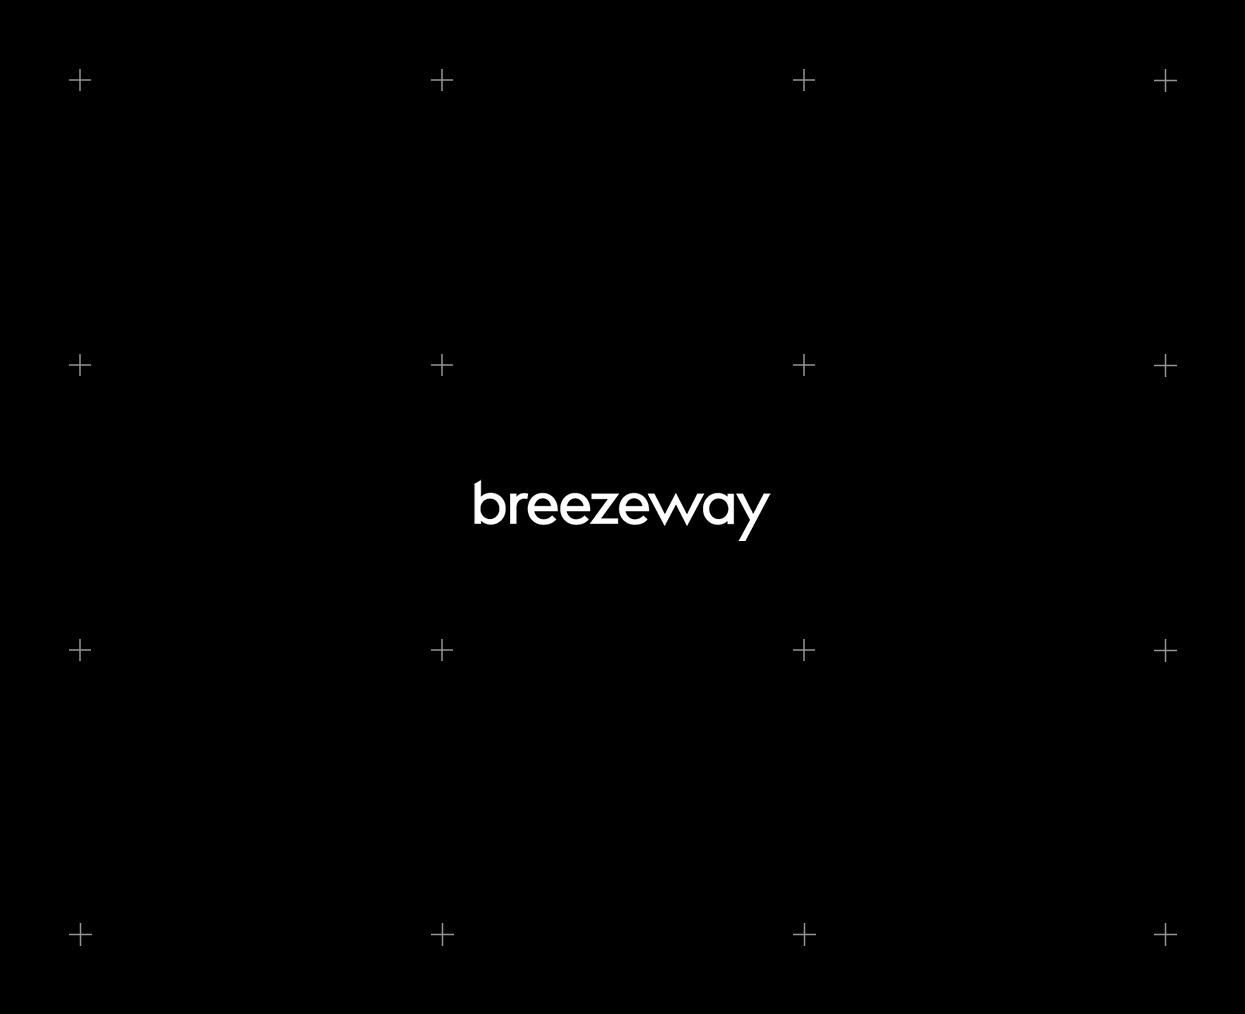 Breezeway_830x66